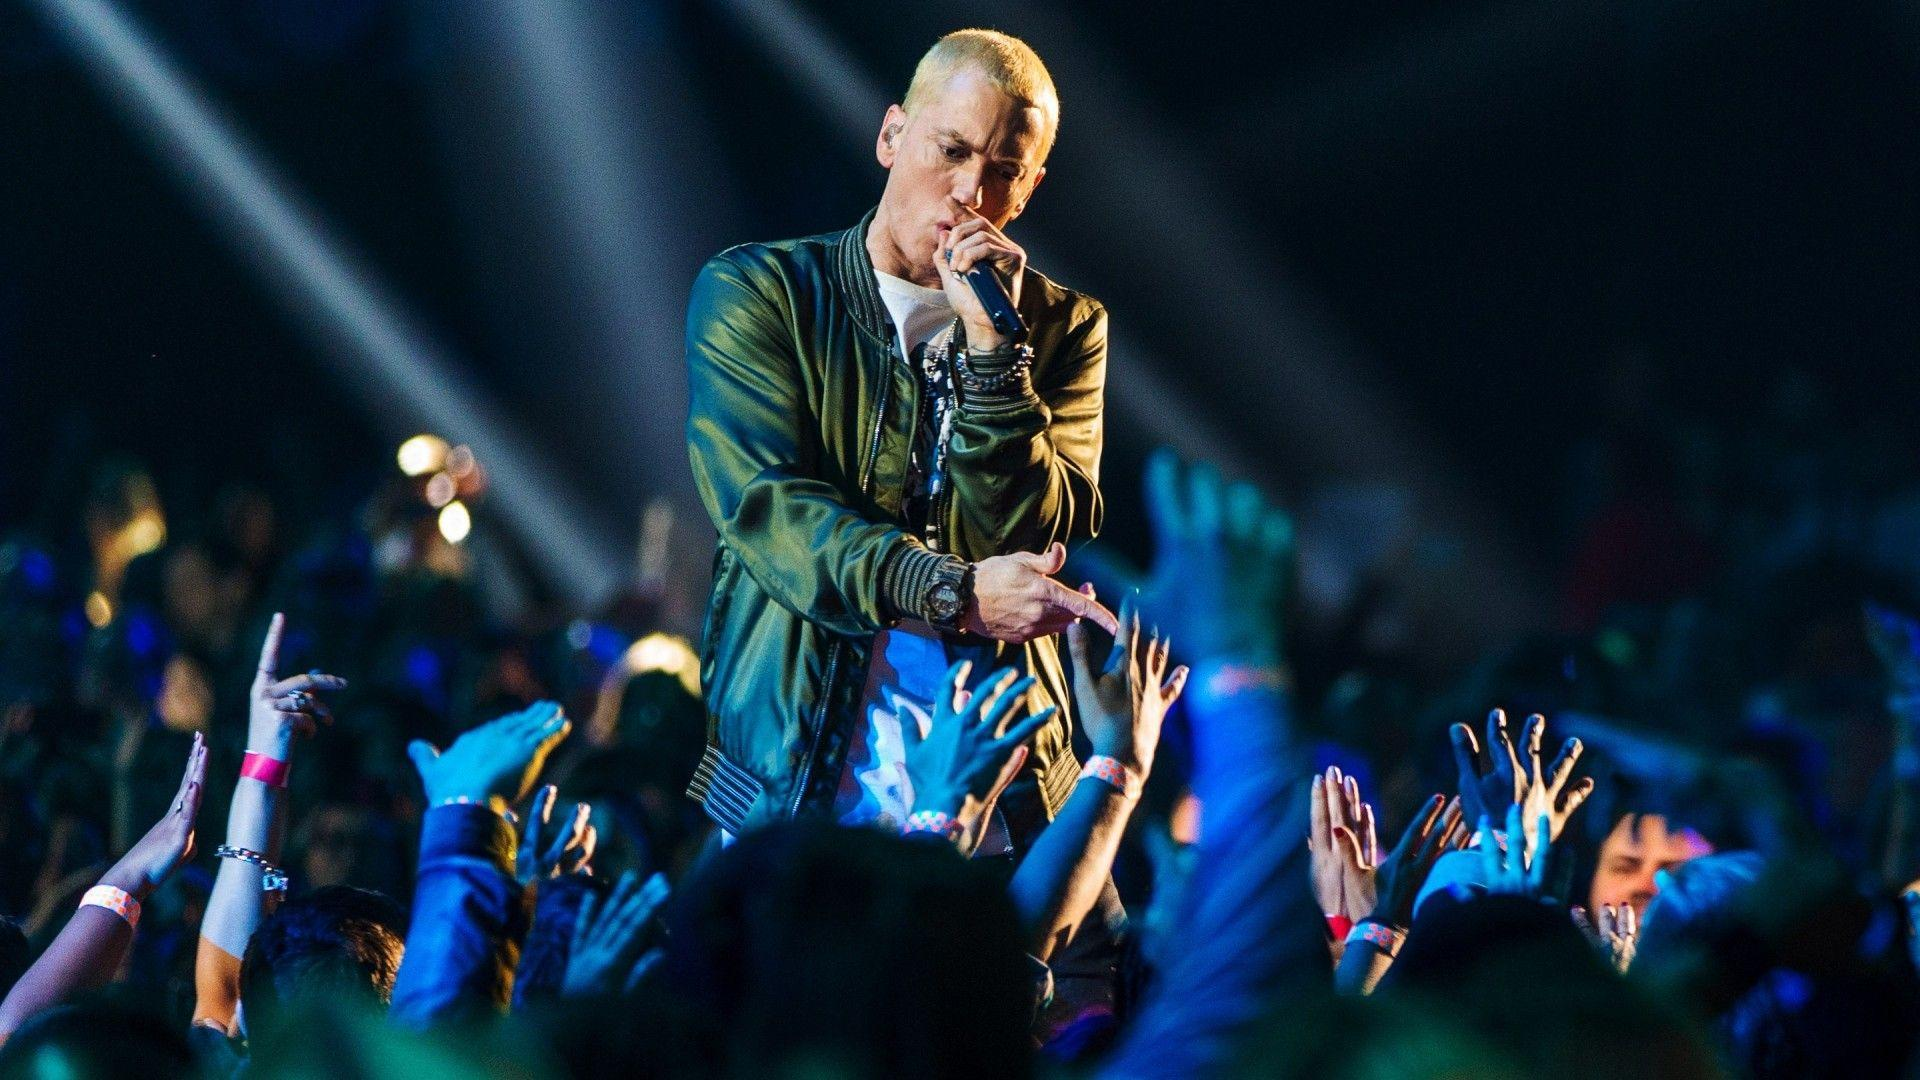 Eminem Full Hd Wallpapers Wallpaper Cave